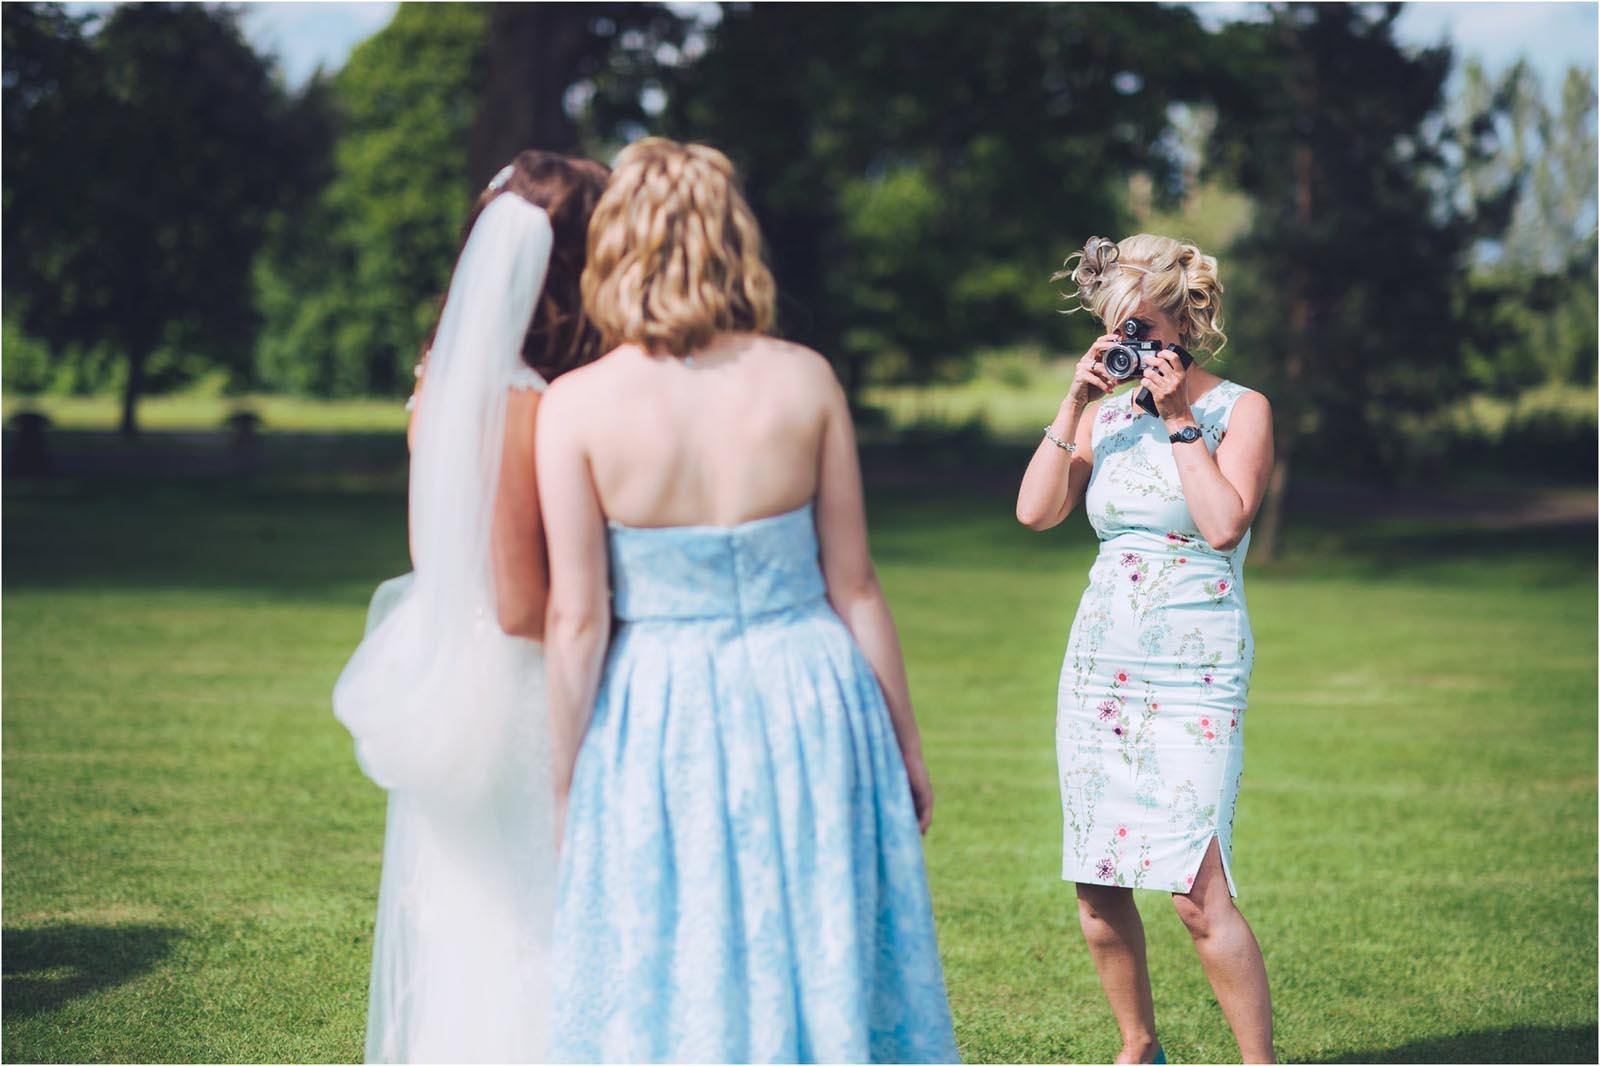 Simon biffen wedding photography 0093